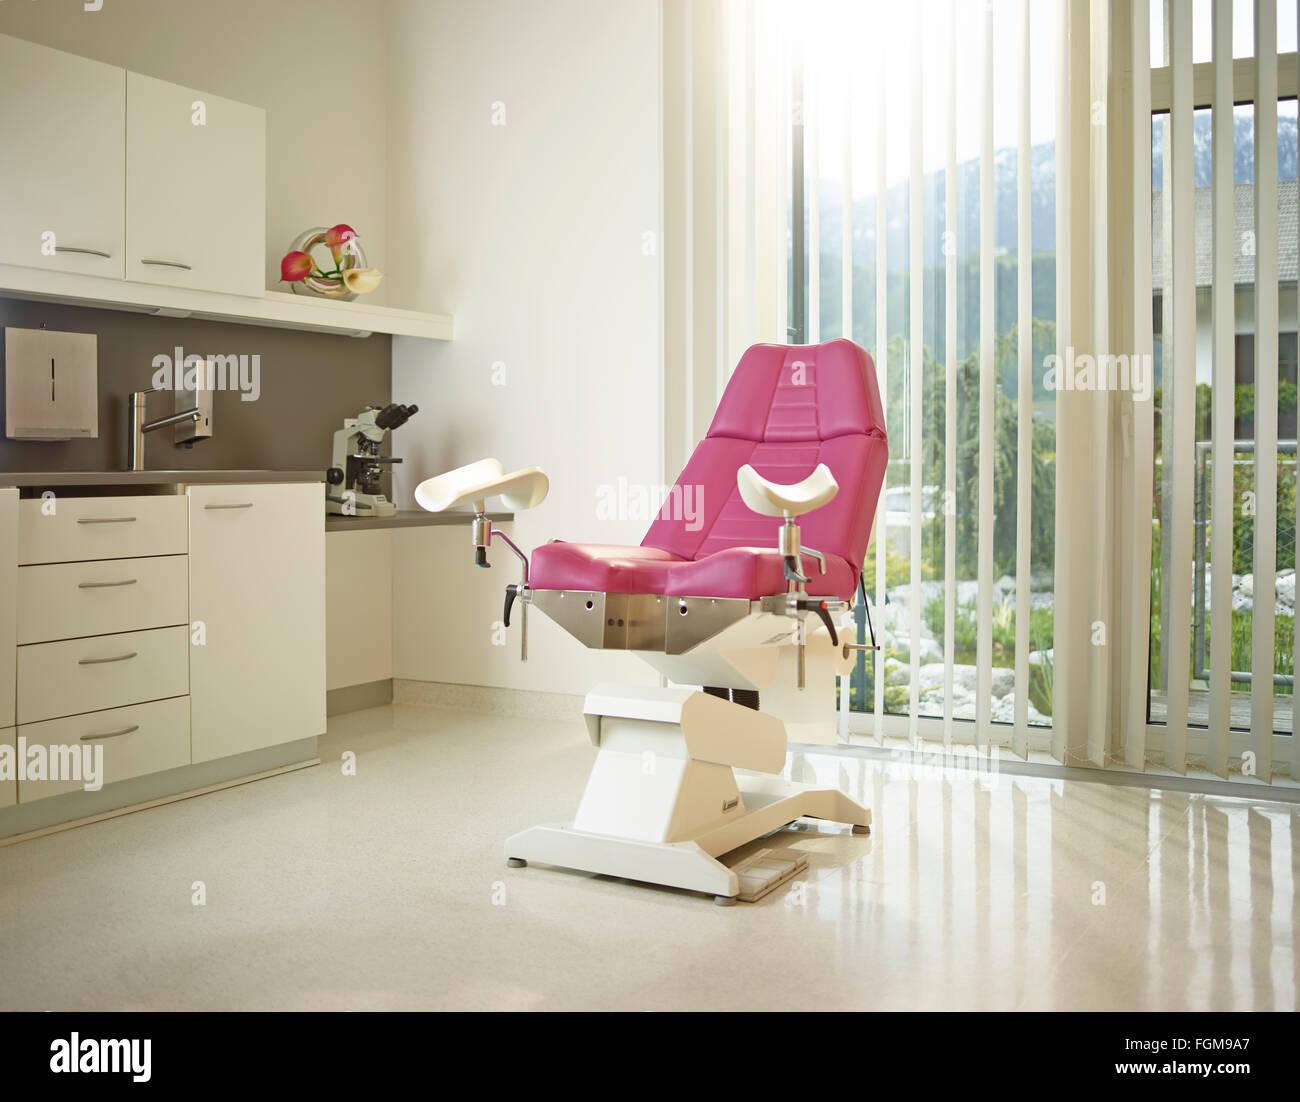 Gynäkologischen Stuhl, Praxis, Österreich Stockbild